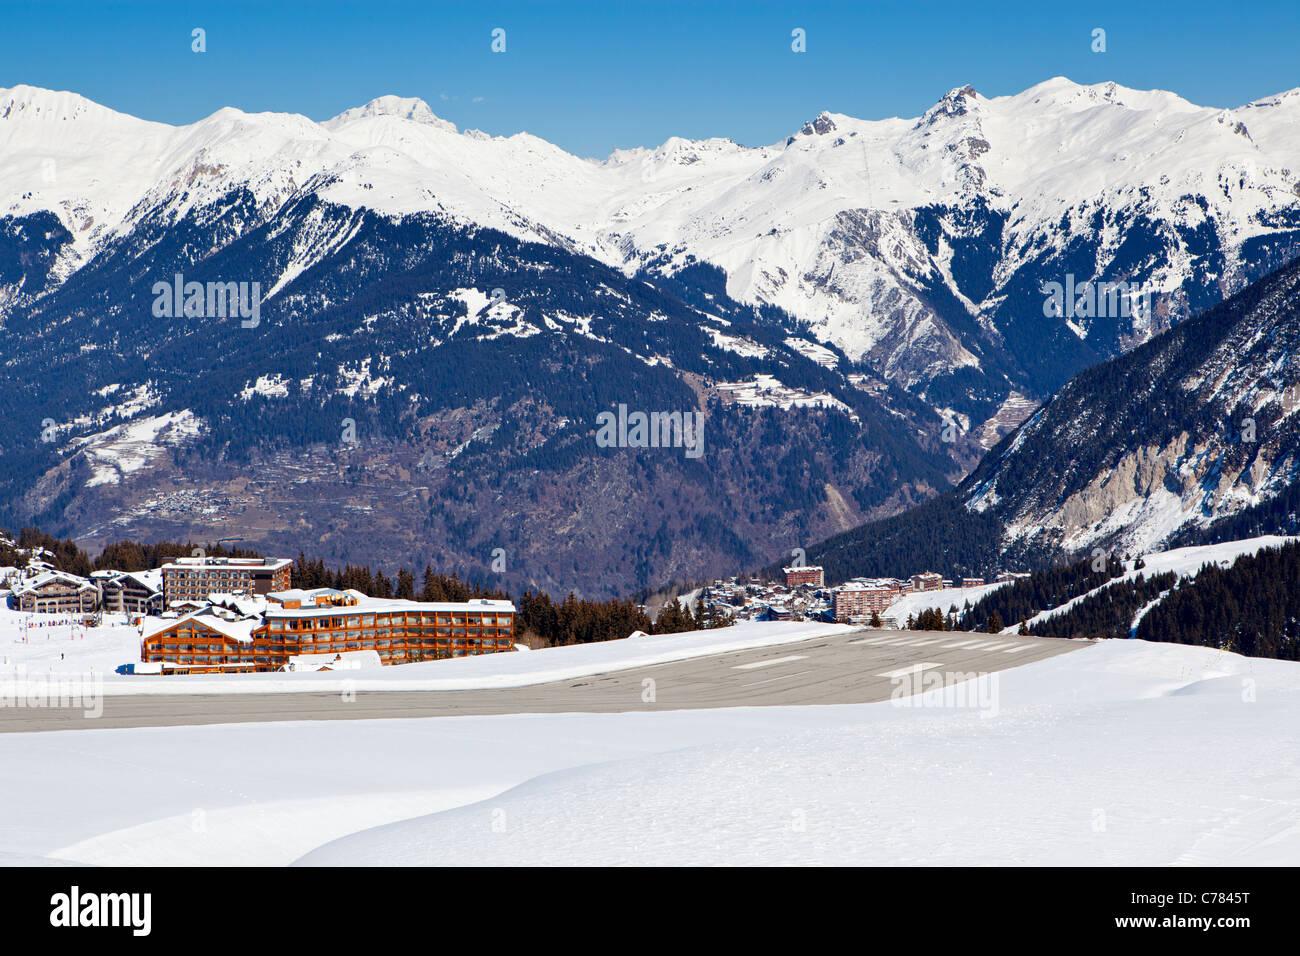 Altiport runway, Courchevel, Savoie, Rhone-Alpes, France. - Stock Image